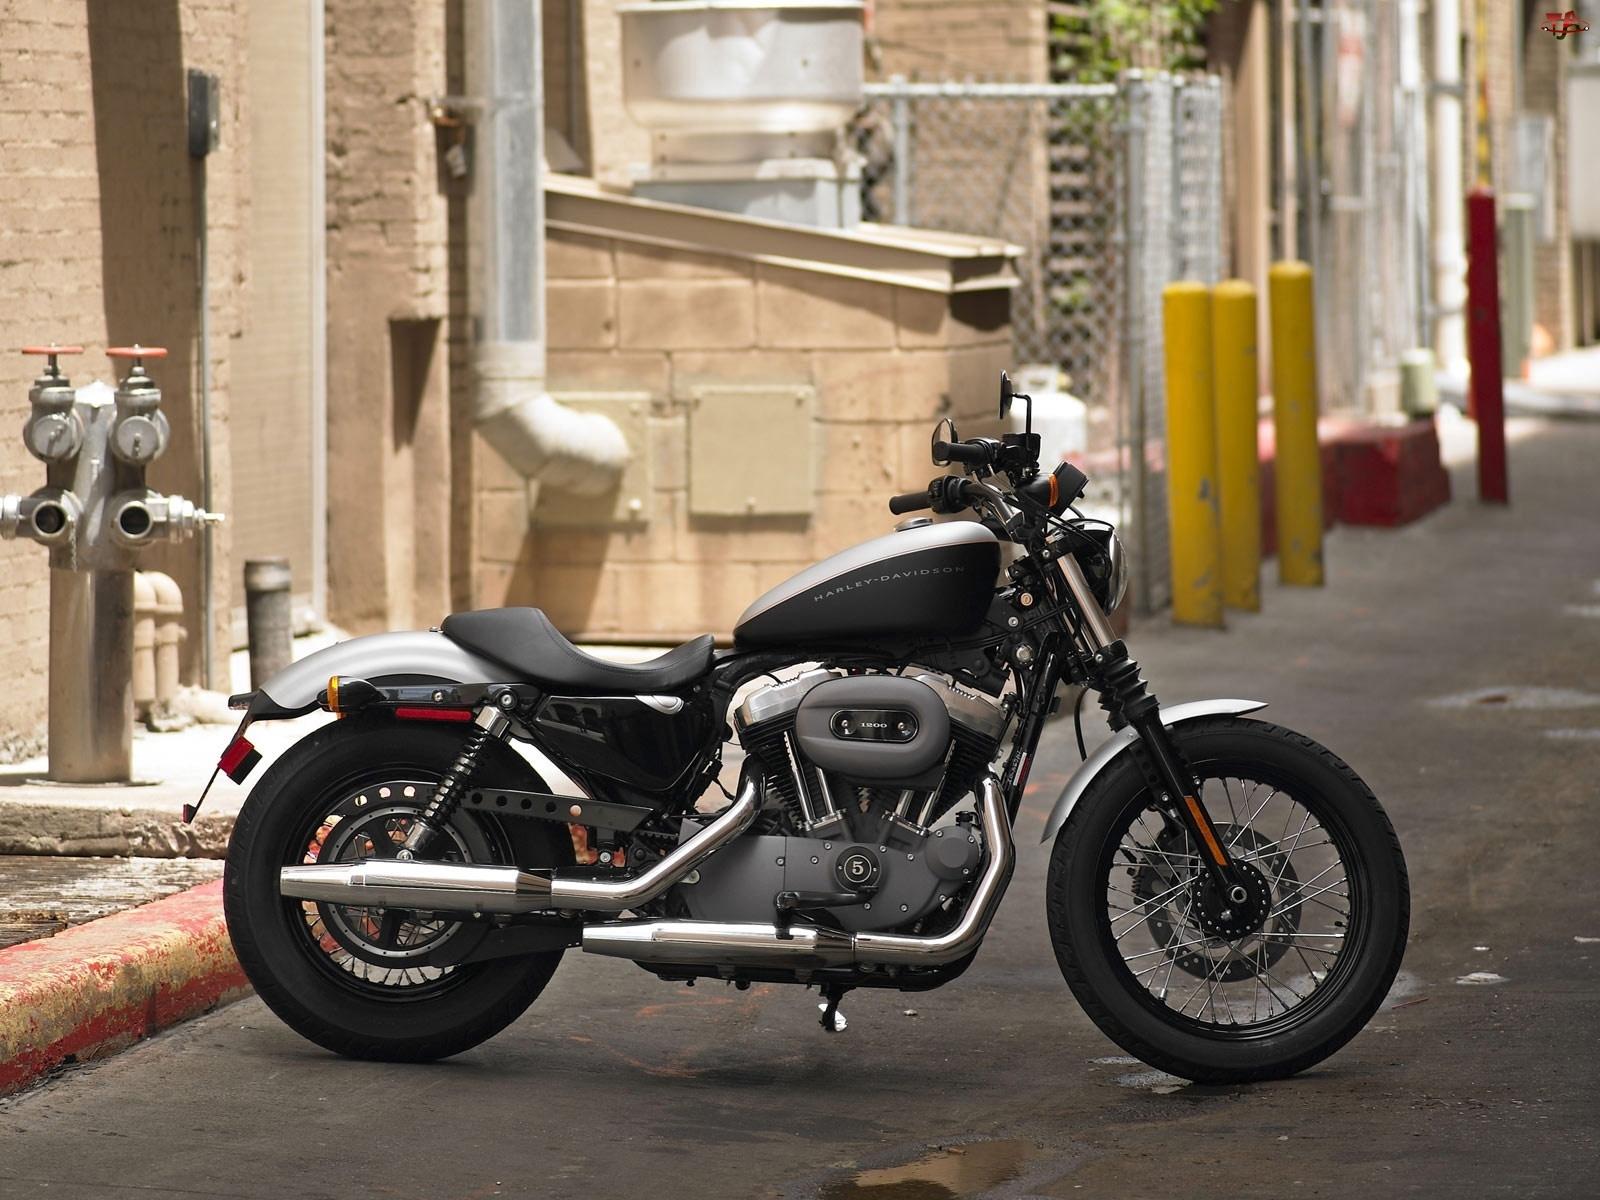 Harley Davidson XL1200N Sportster